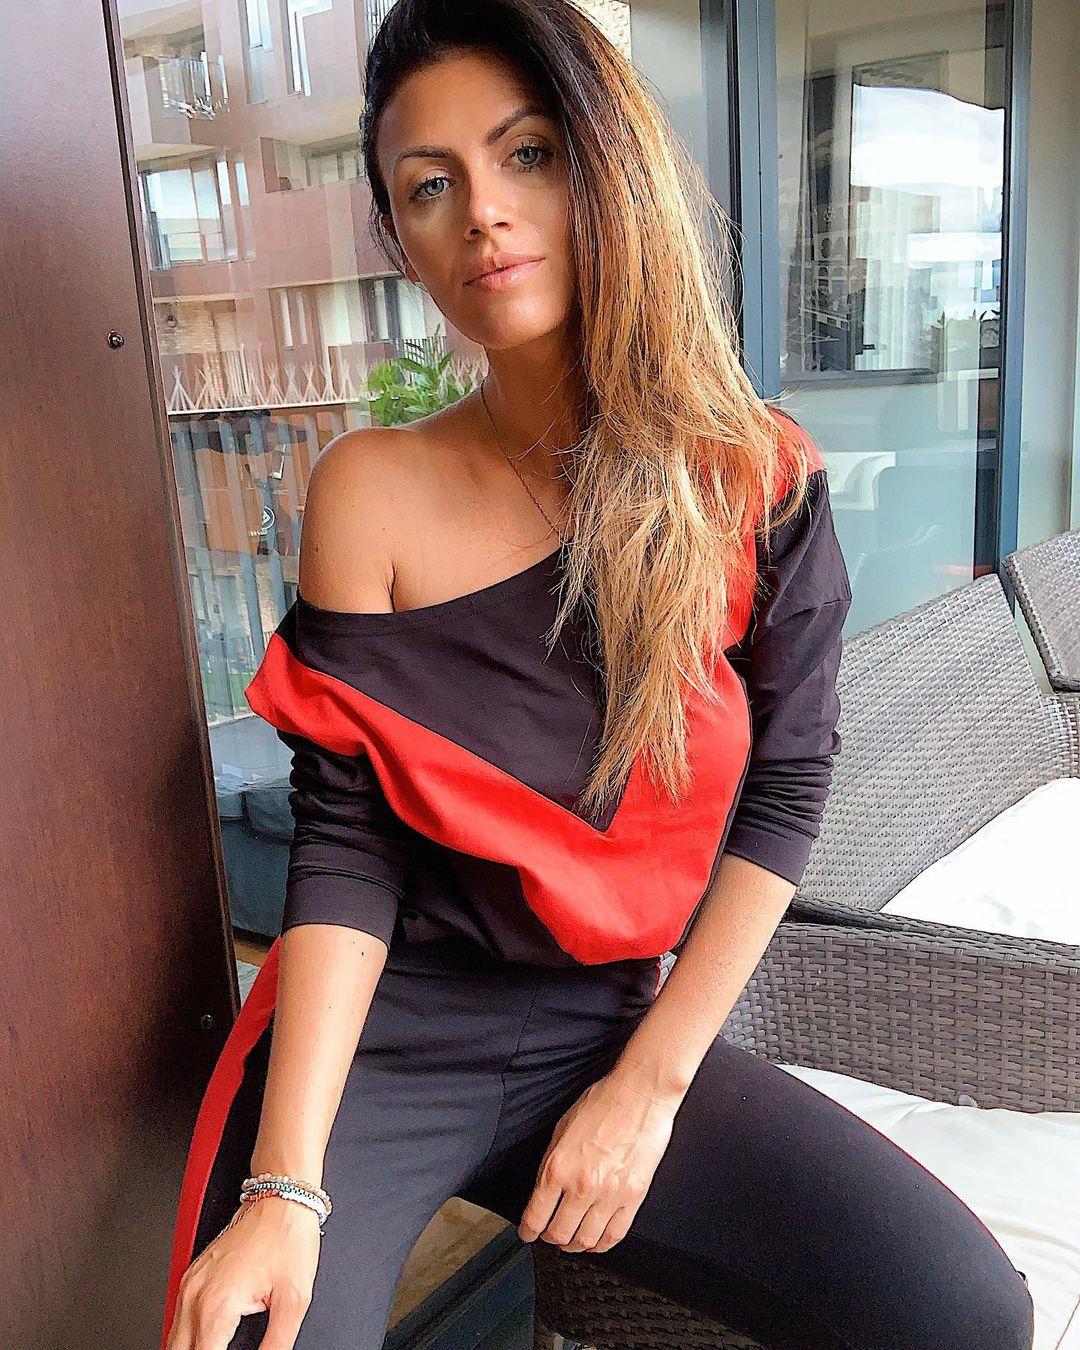 Marta Barczok Instagram